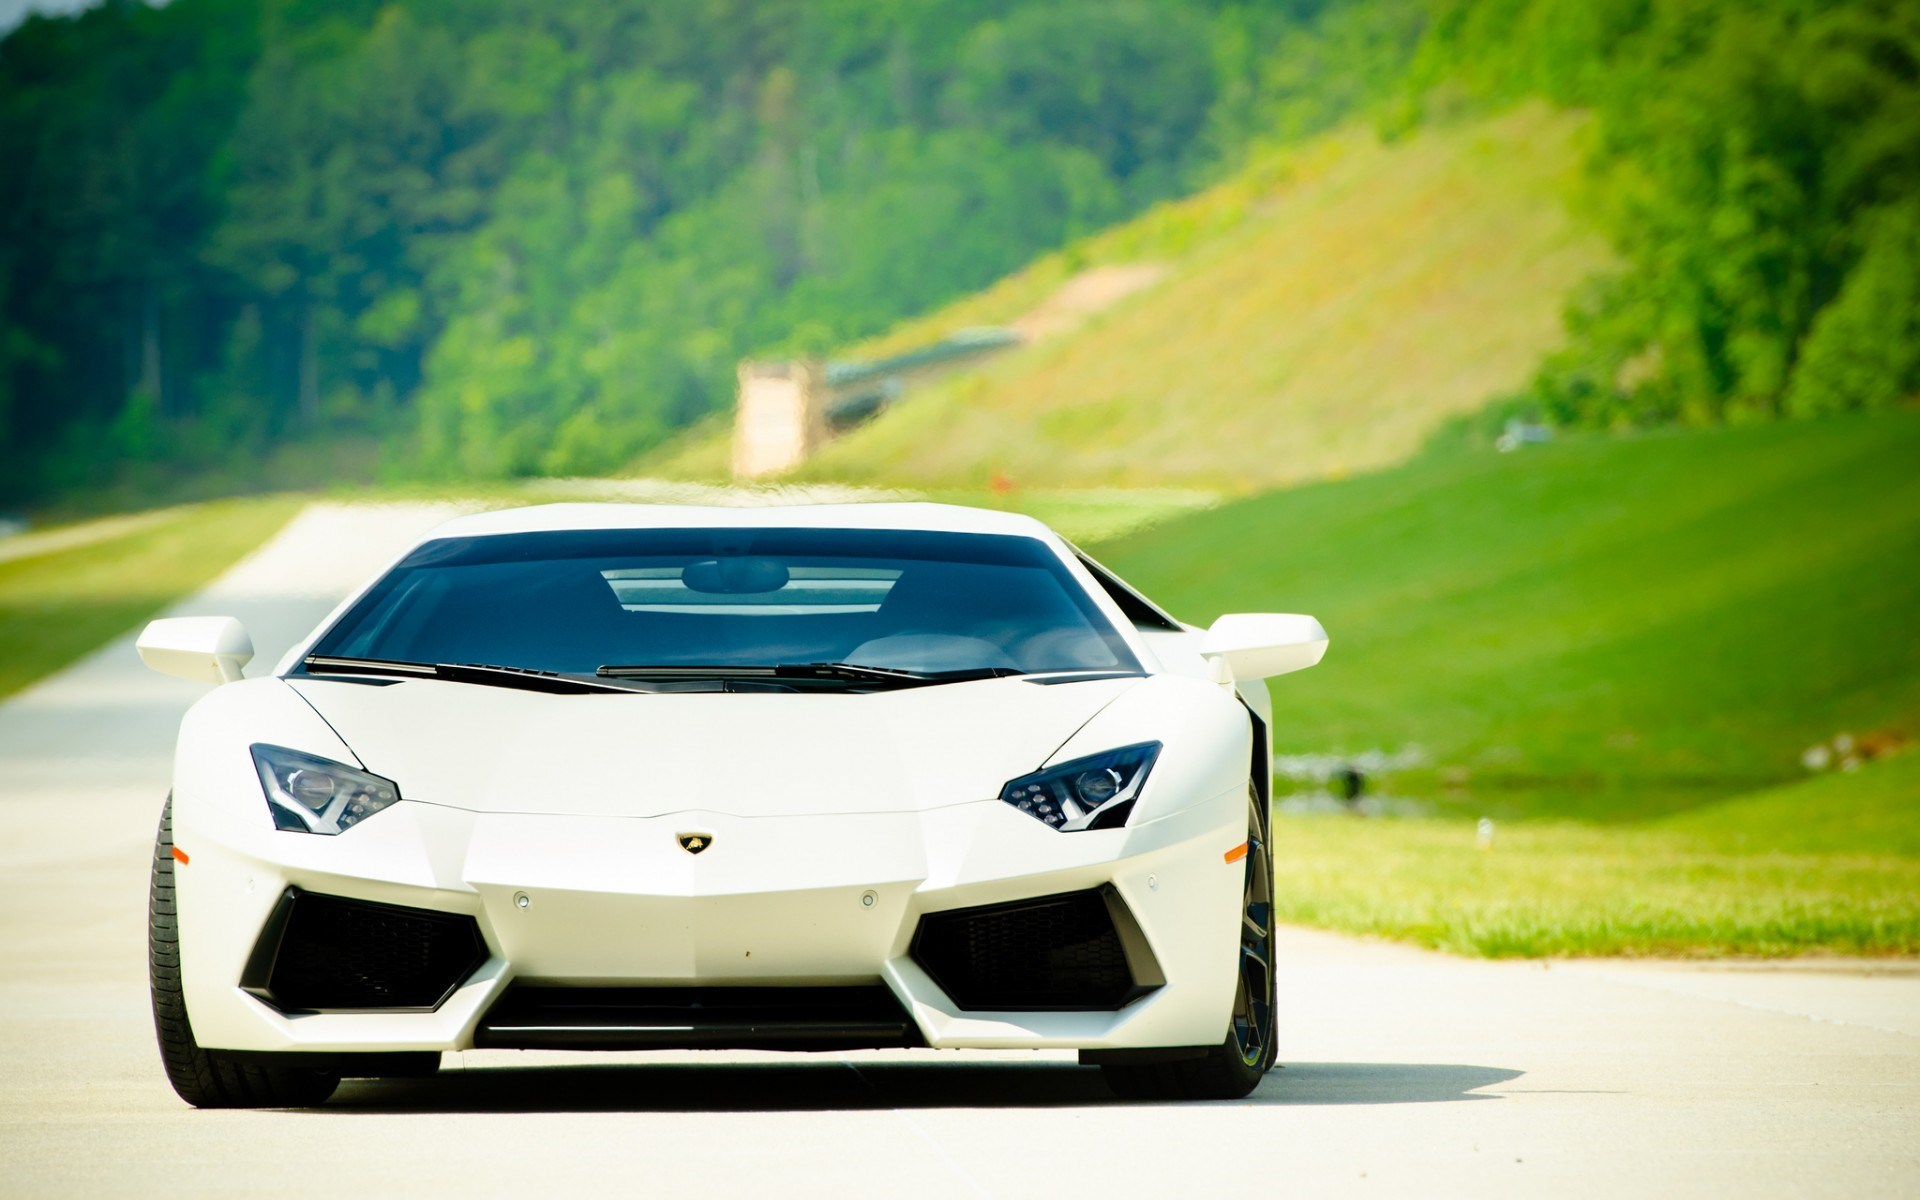 Lamborghini Aventador Wallpapers High Quality